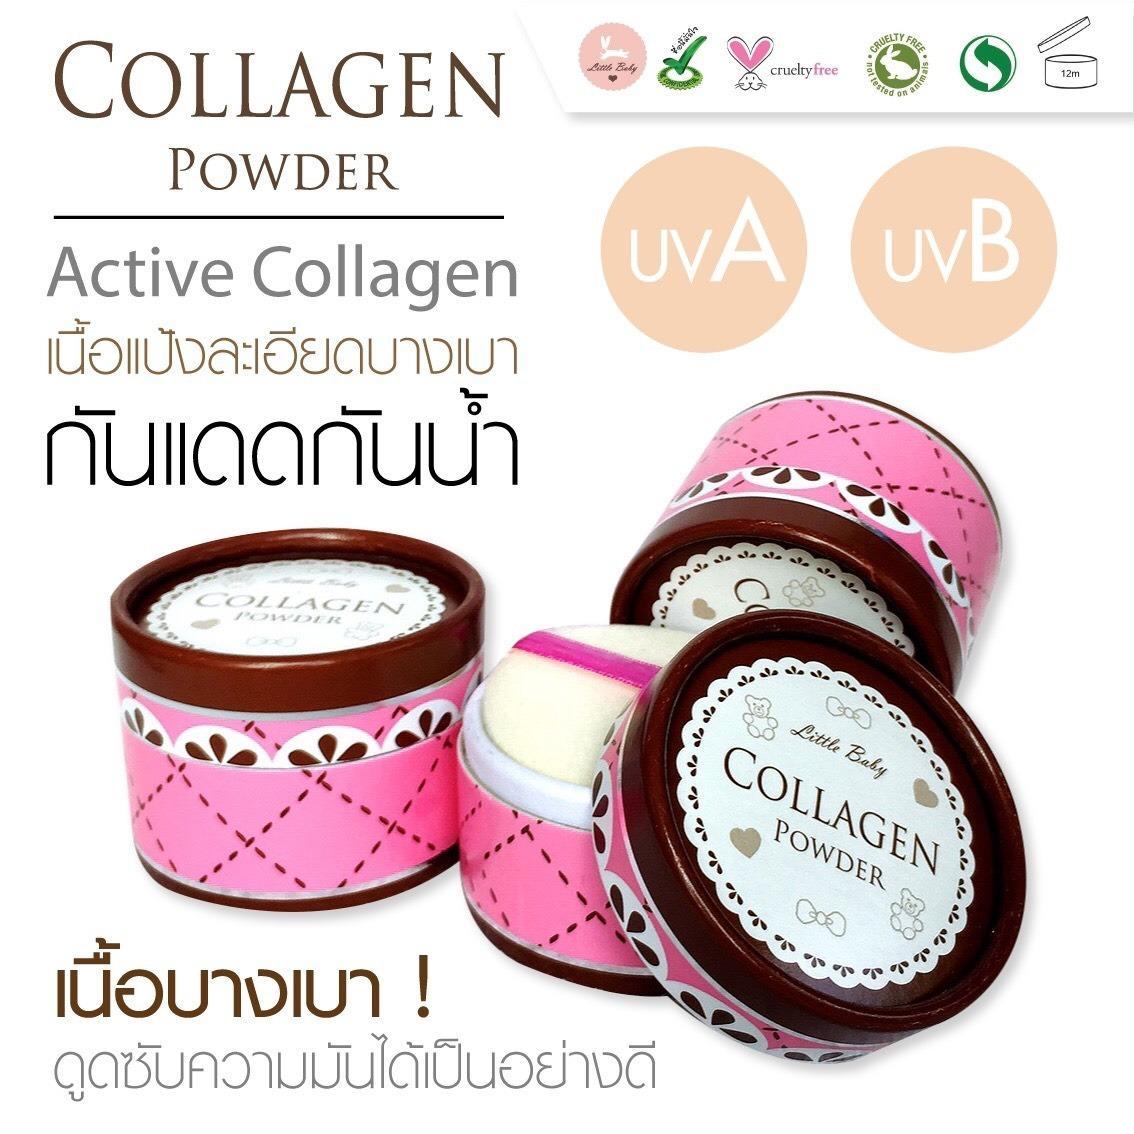 HARGA PROMO Khusus Hari Ini/Little Baby Collagen Powder / Bedak Collagen / Original 100{55e037da9a70d2f692182bf73e9ad7c46940d20c7297ef2687c837f7bdb7b002}